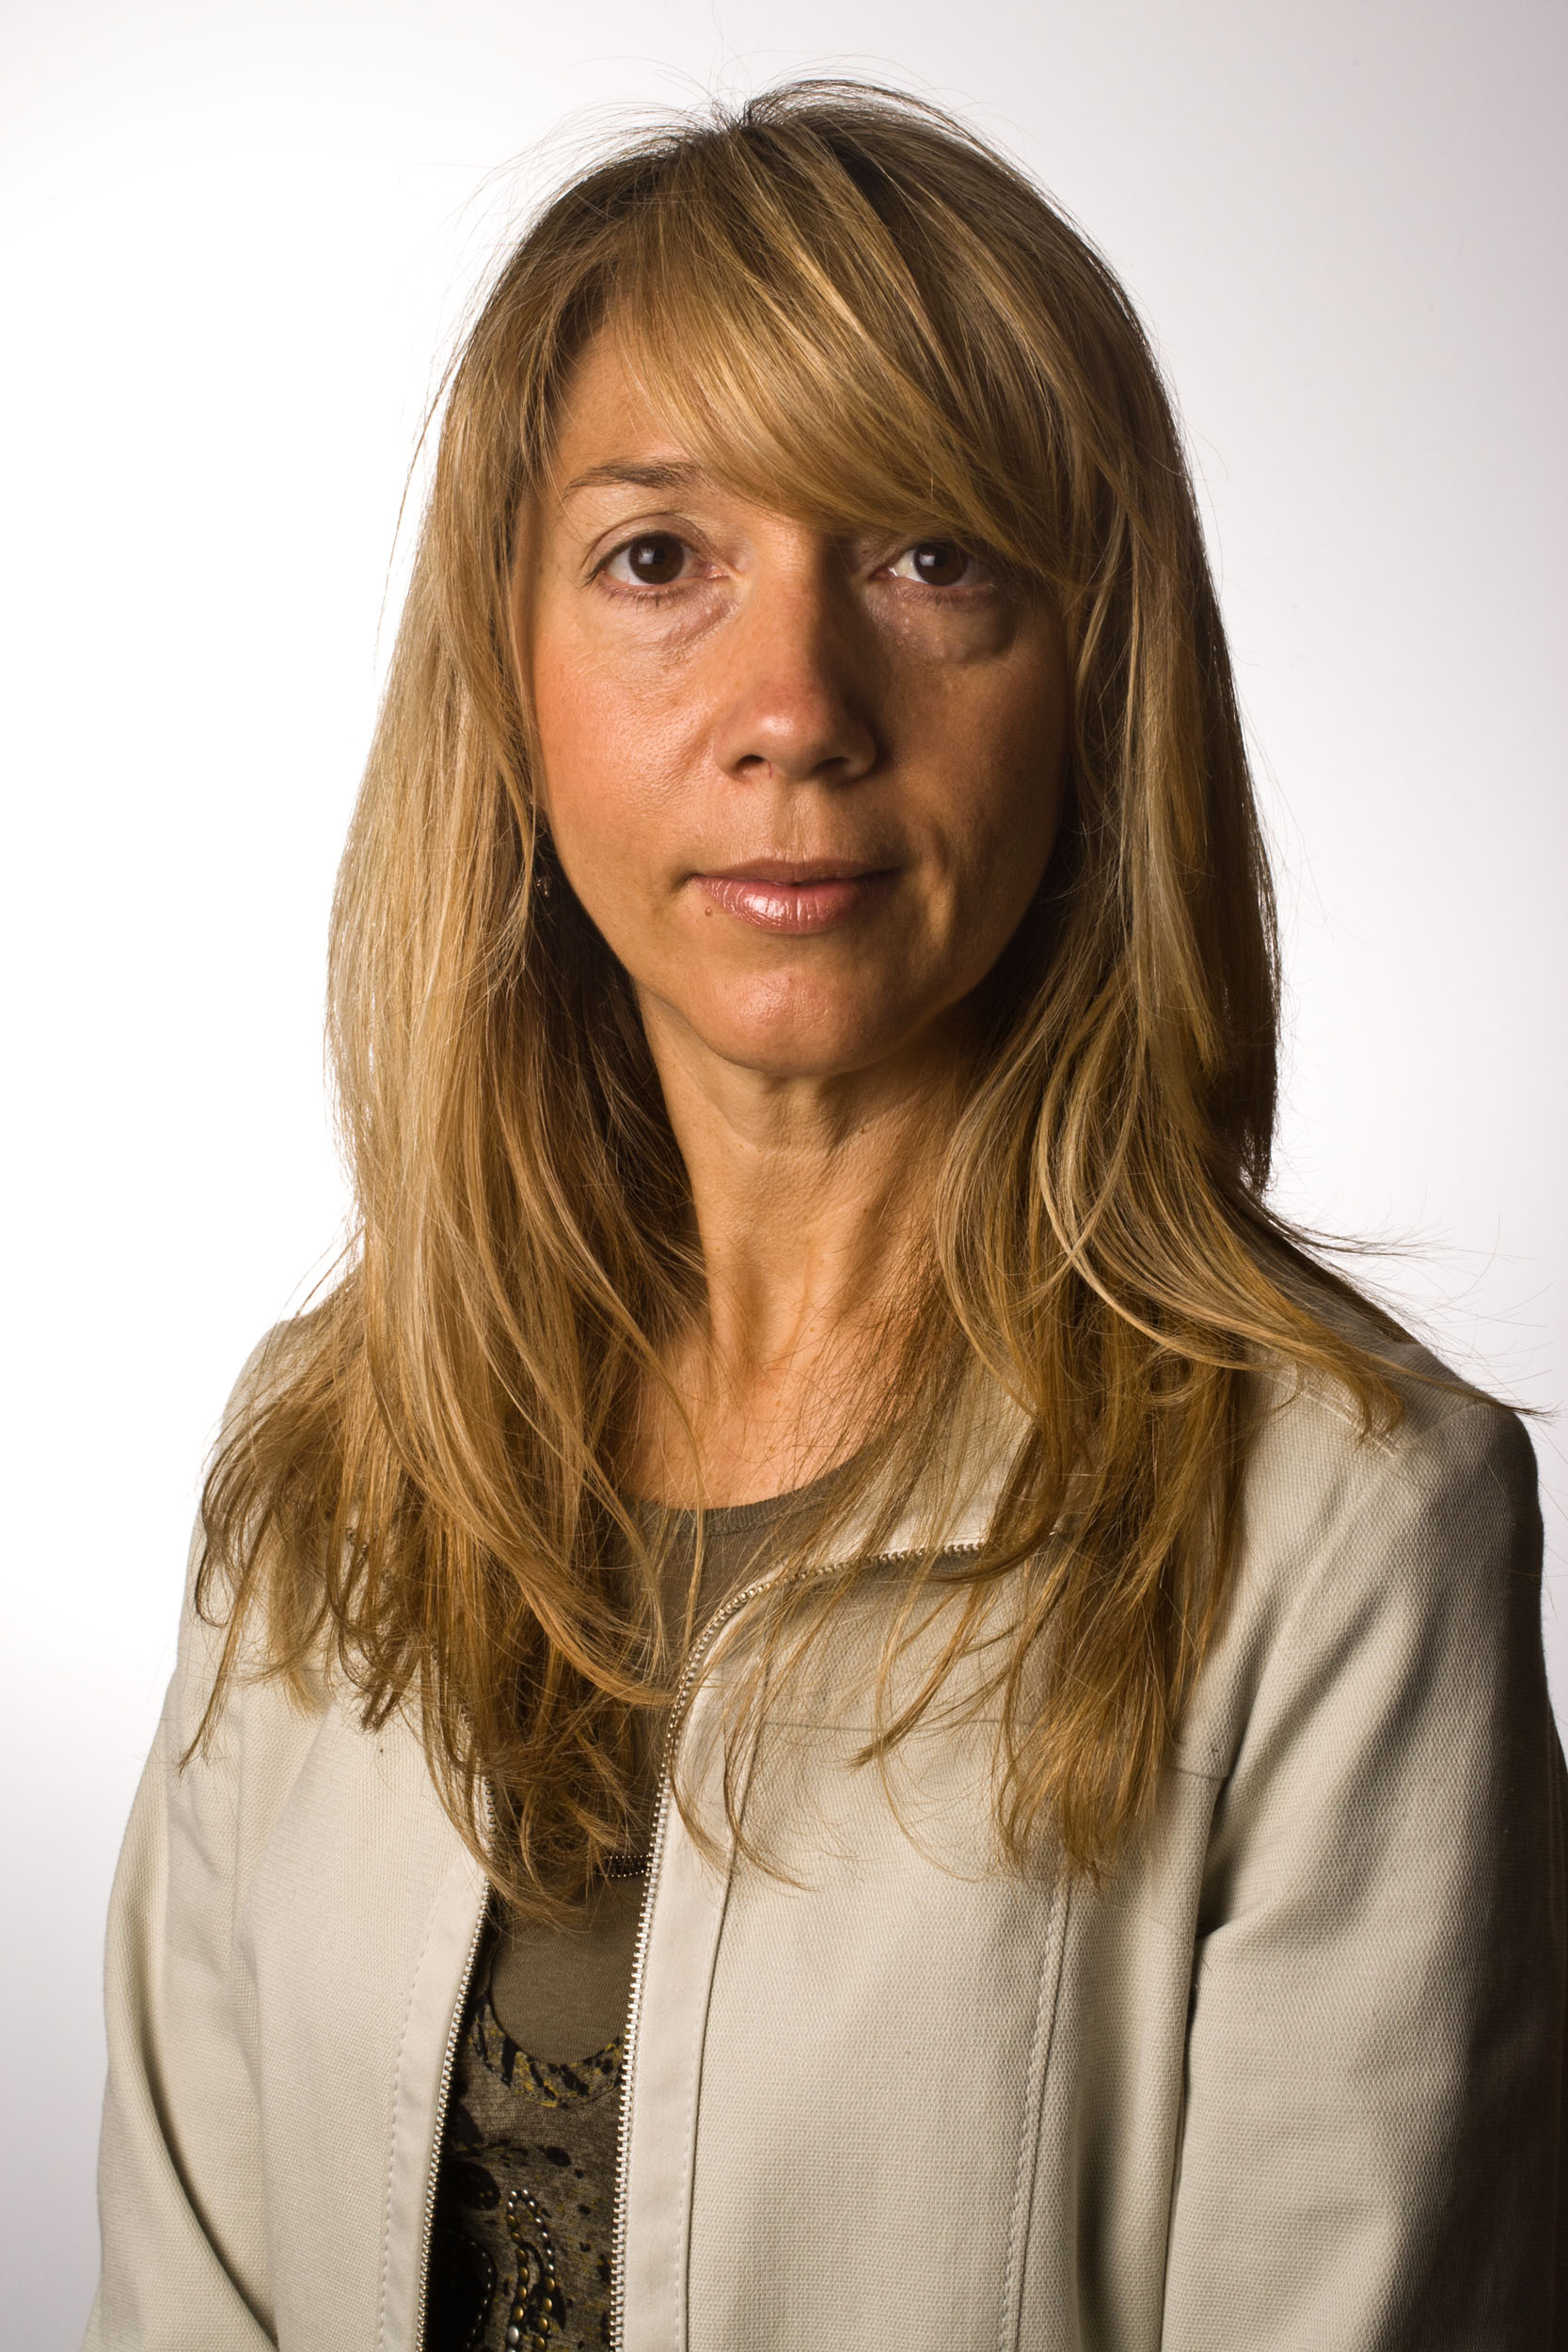 Celine Mandicó Garcia